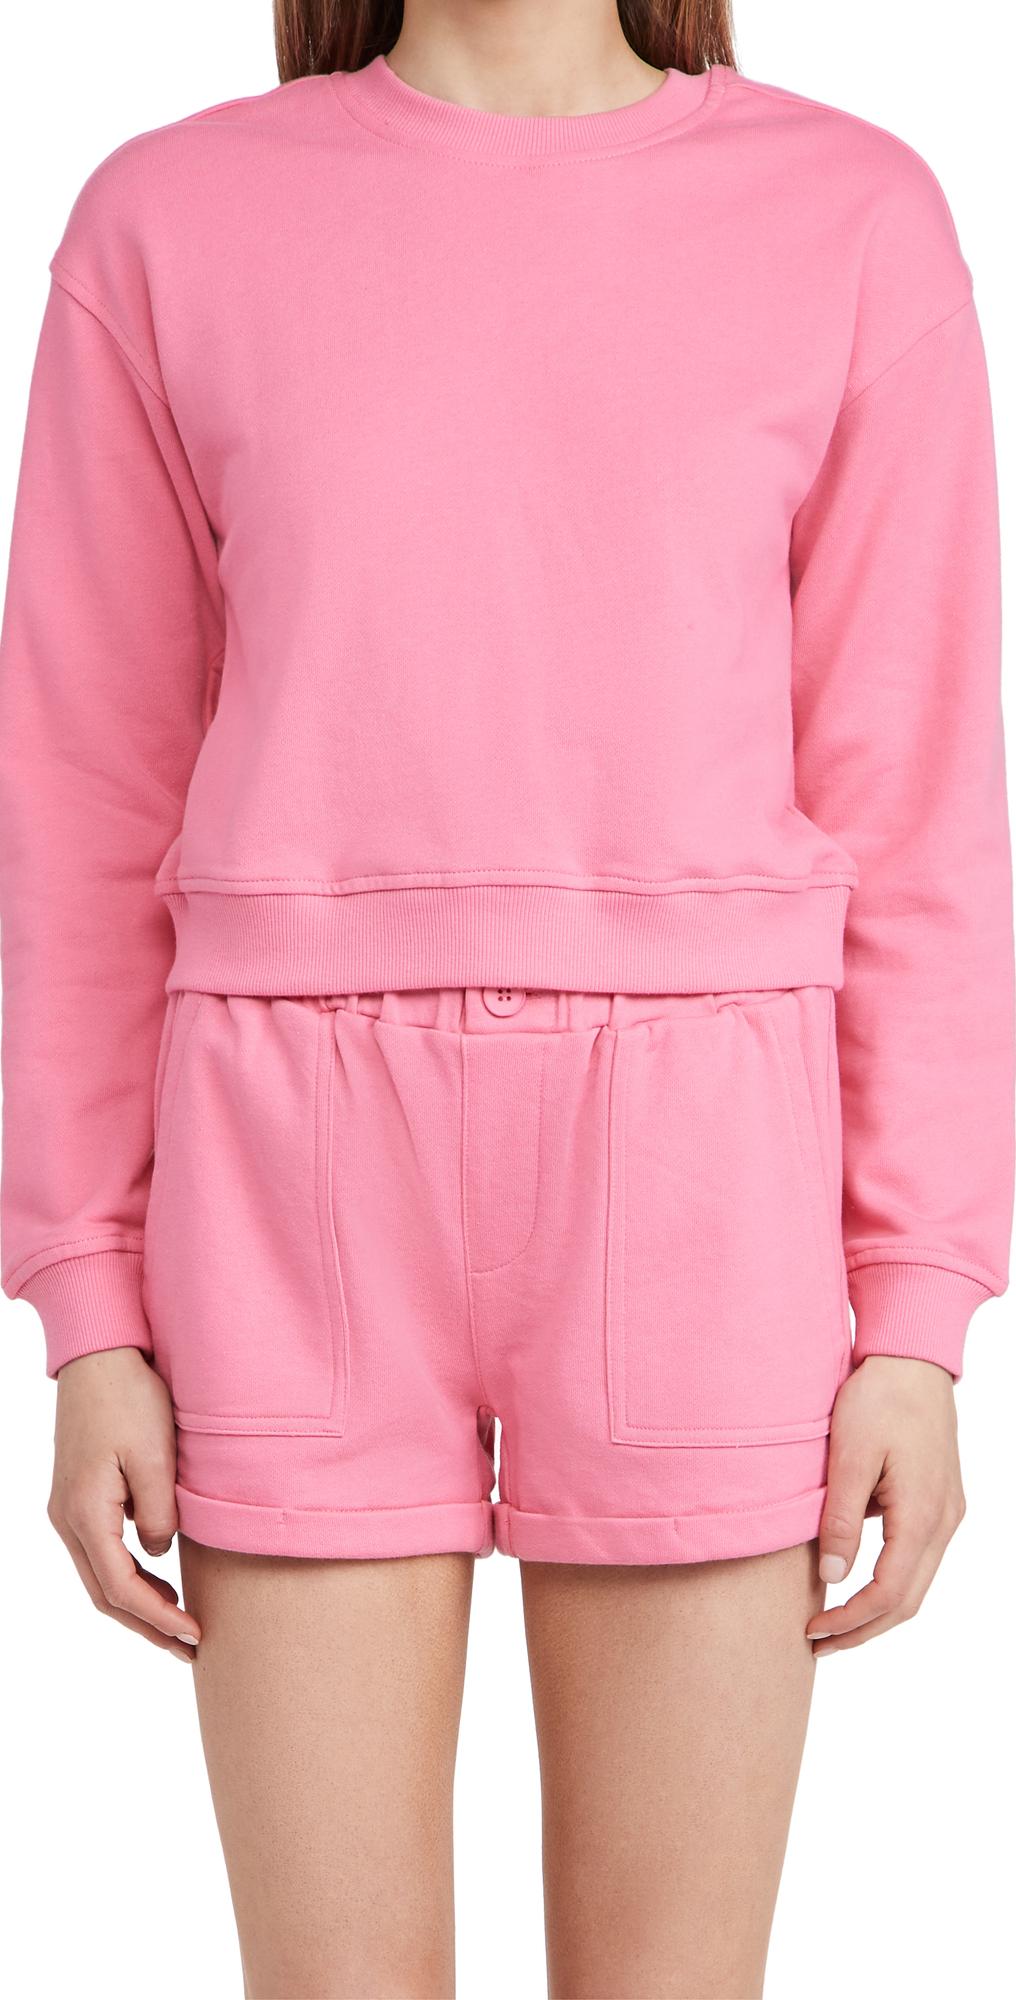 Sweet But Tough Sweatshirt